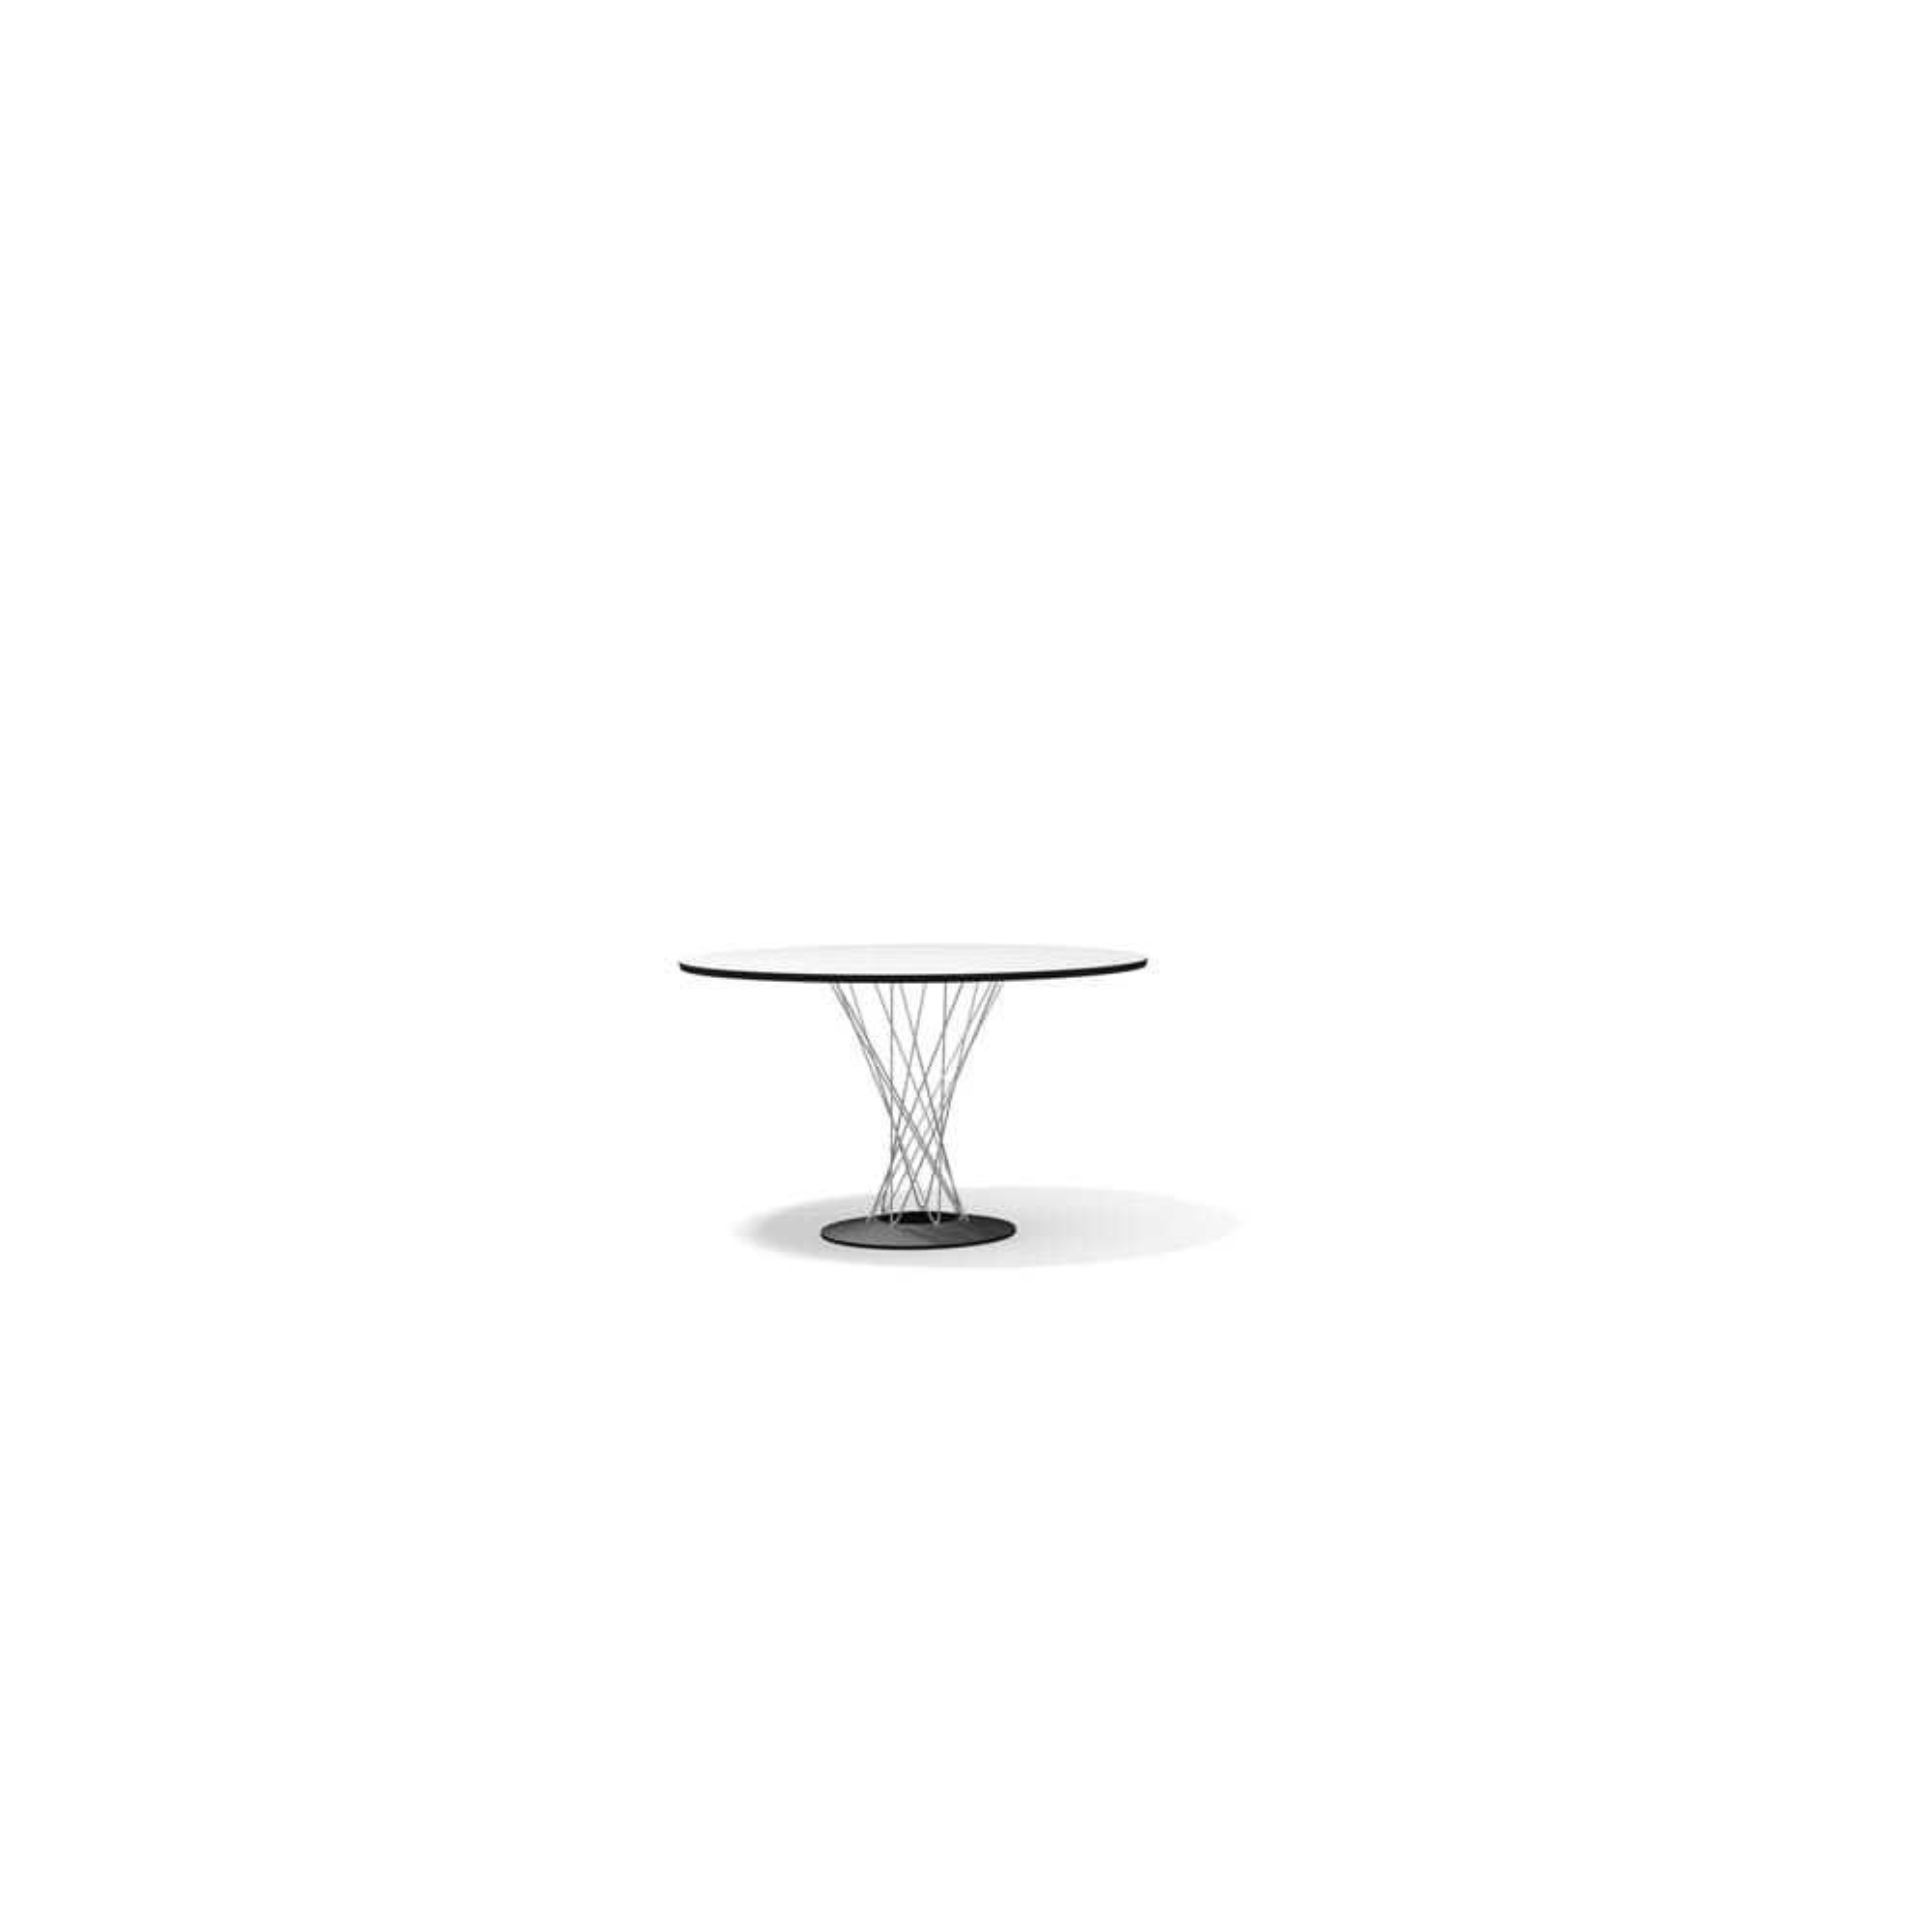 Vitra Noguchi Dining Table : vitra vitra noguchi dining table p182 1406image from www.wellworking.co.uk size 1000 x 1000 jpeg 24kB